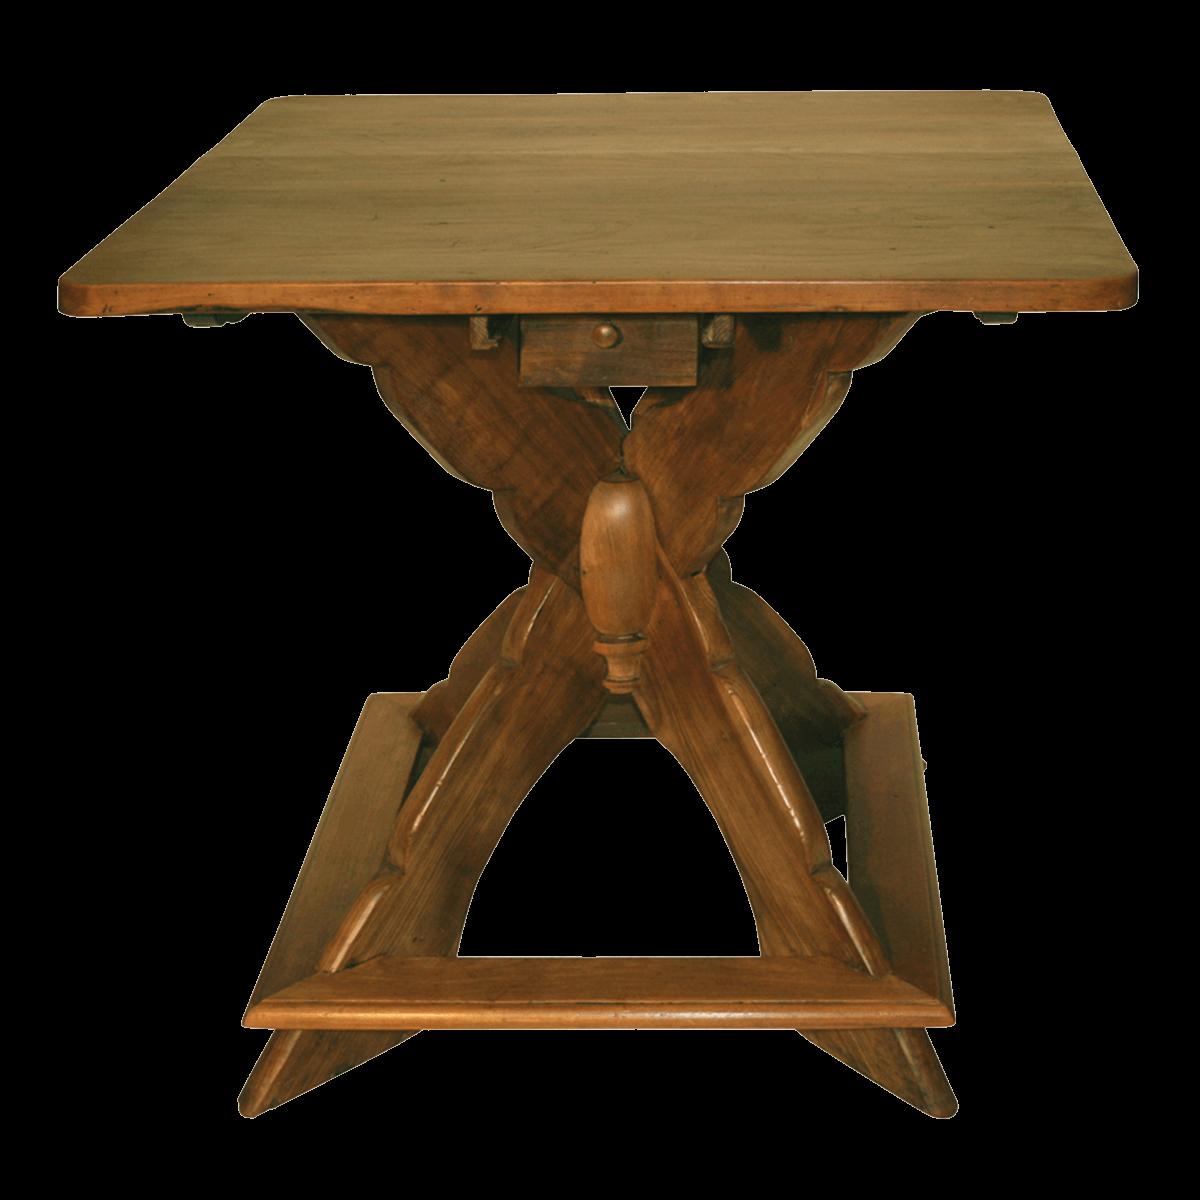 Petite table à pieds araignée